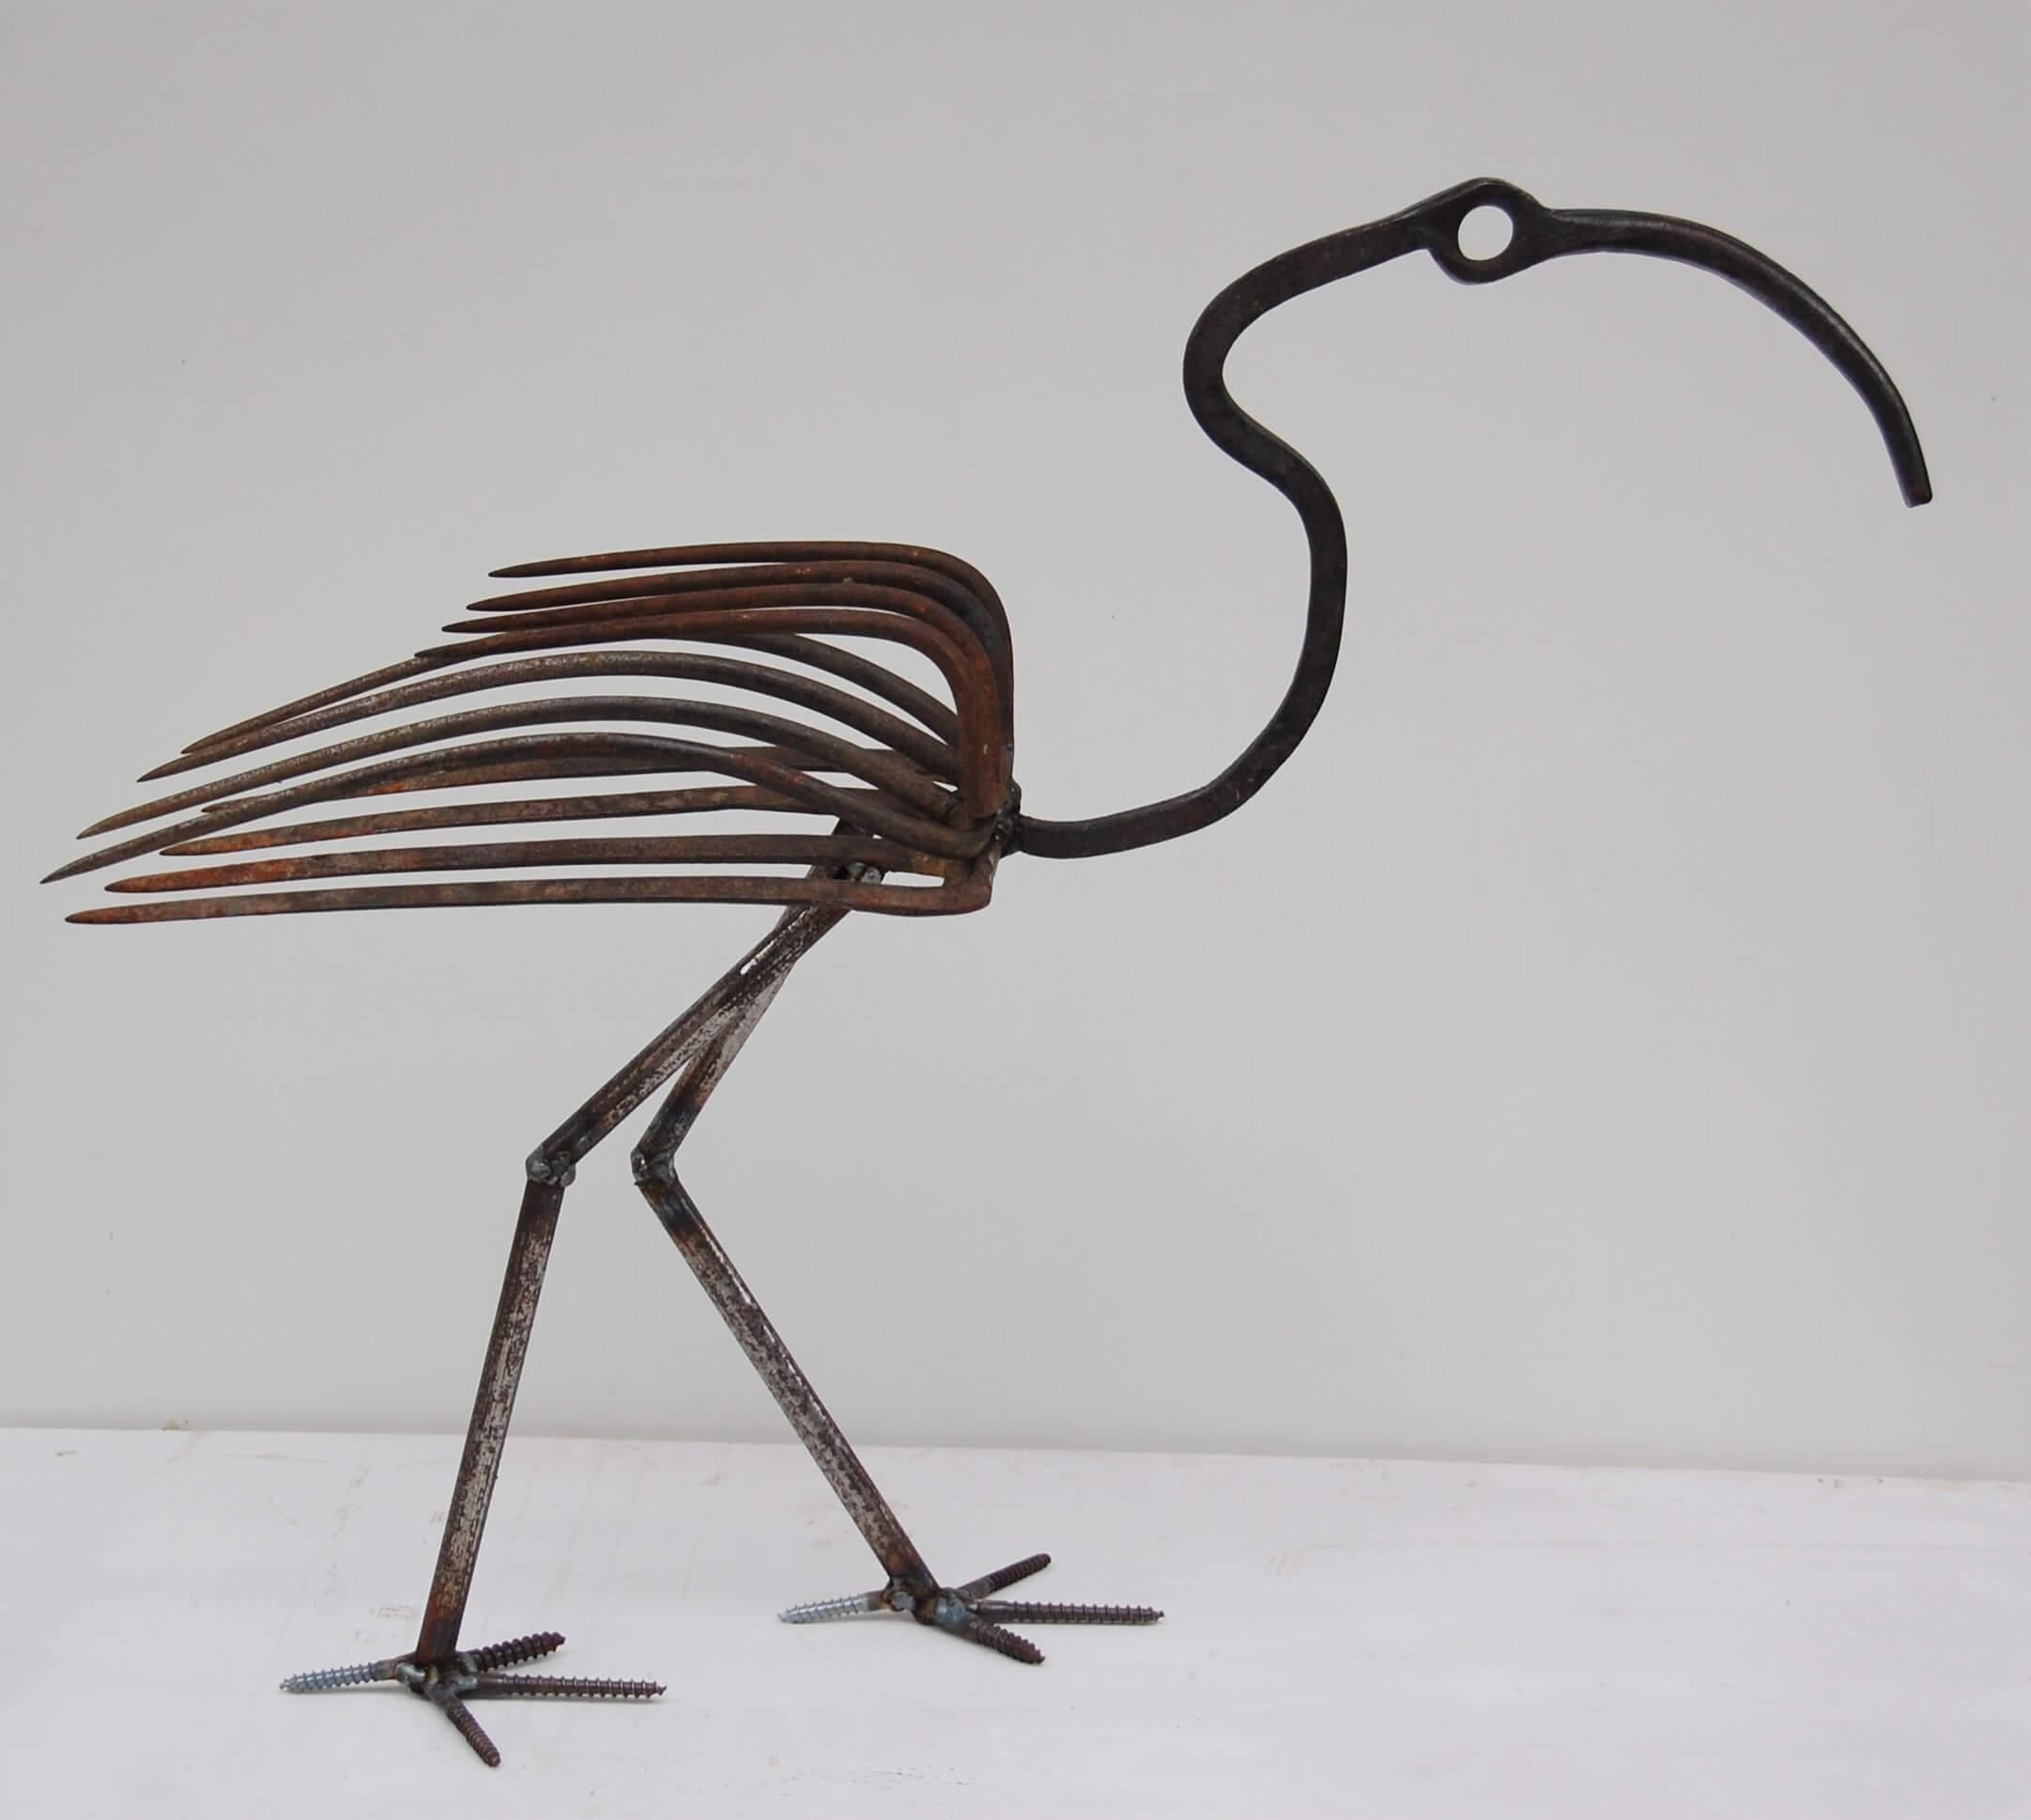 ibis mâle